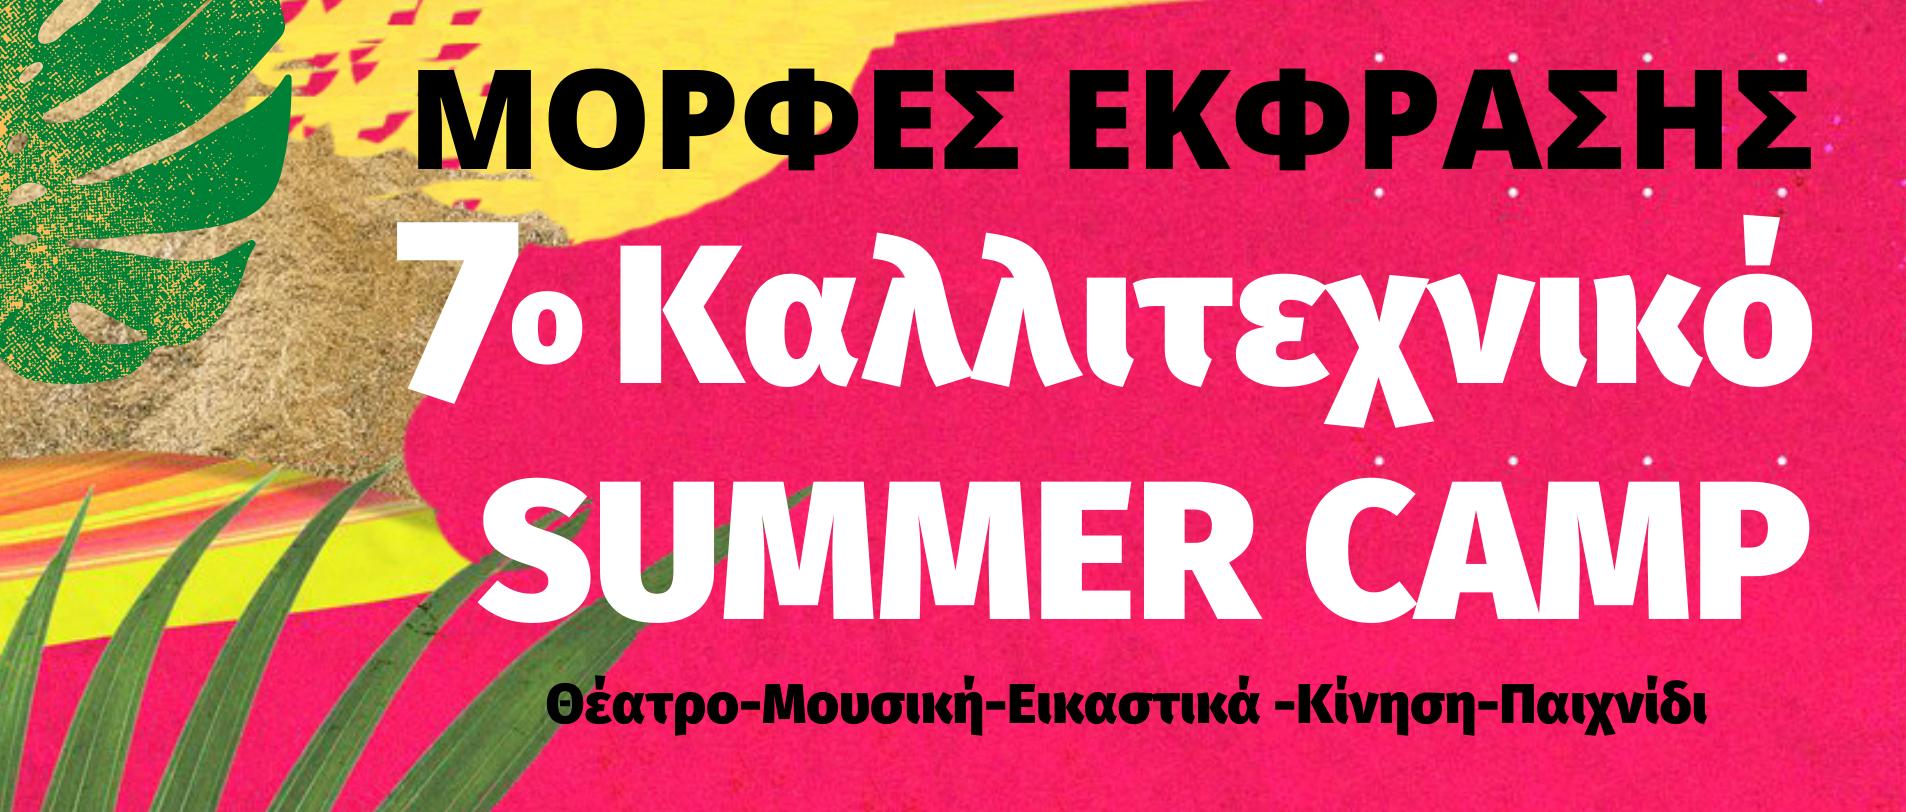 summercampslider